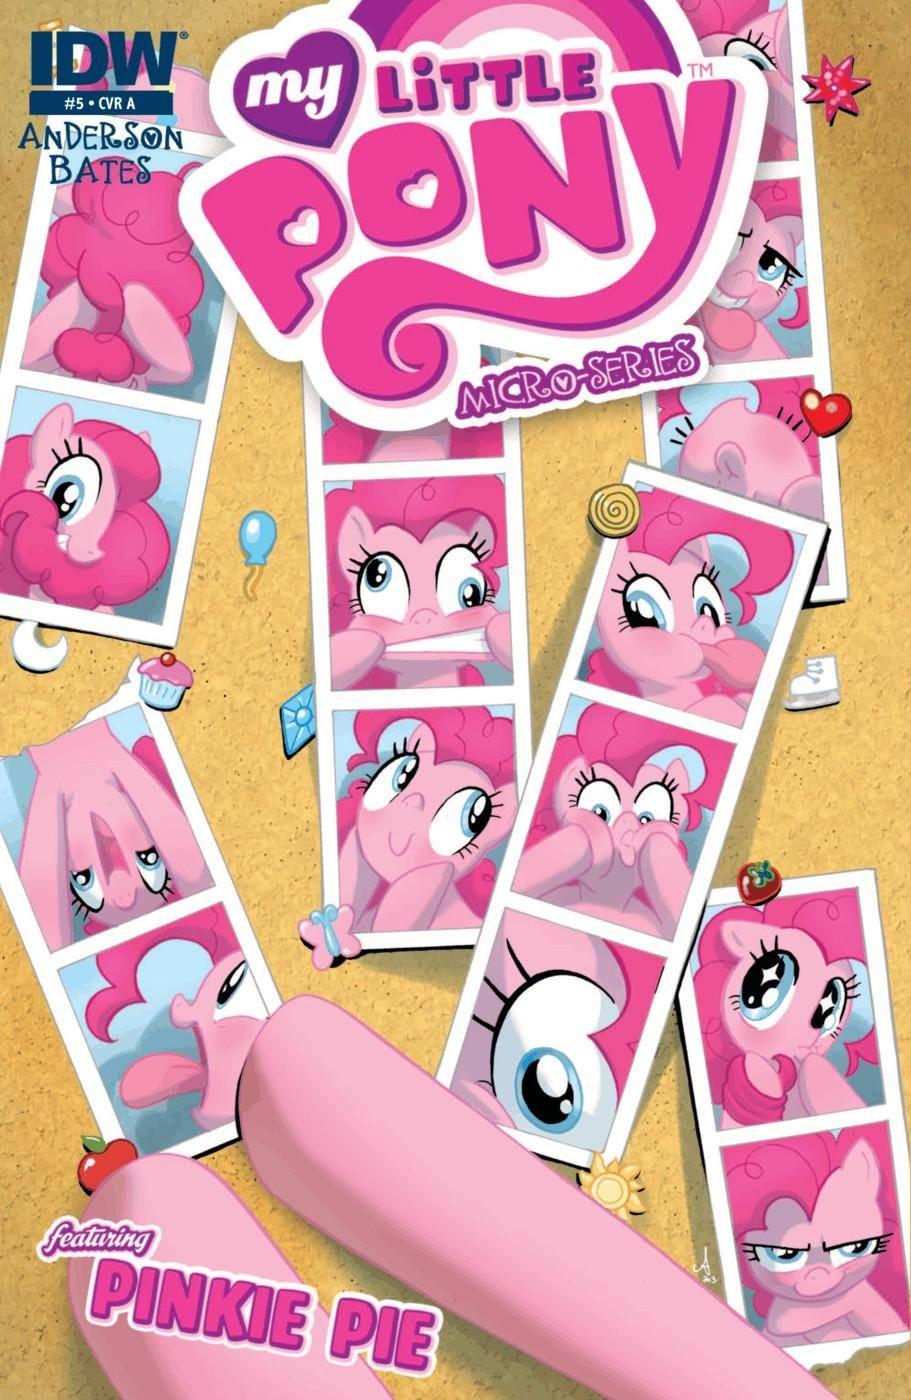 My Little Pony - Micro Series 005 Pinkie Pie 2013 2 covers digital